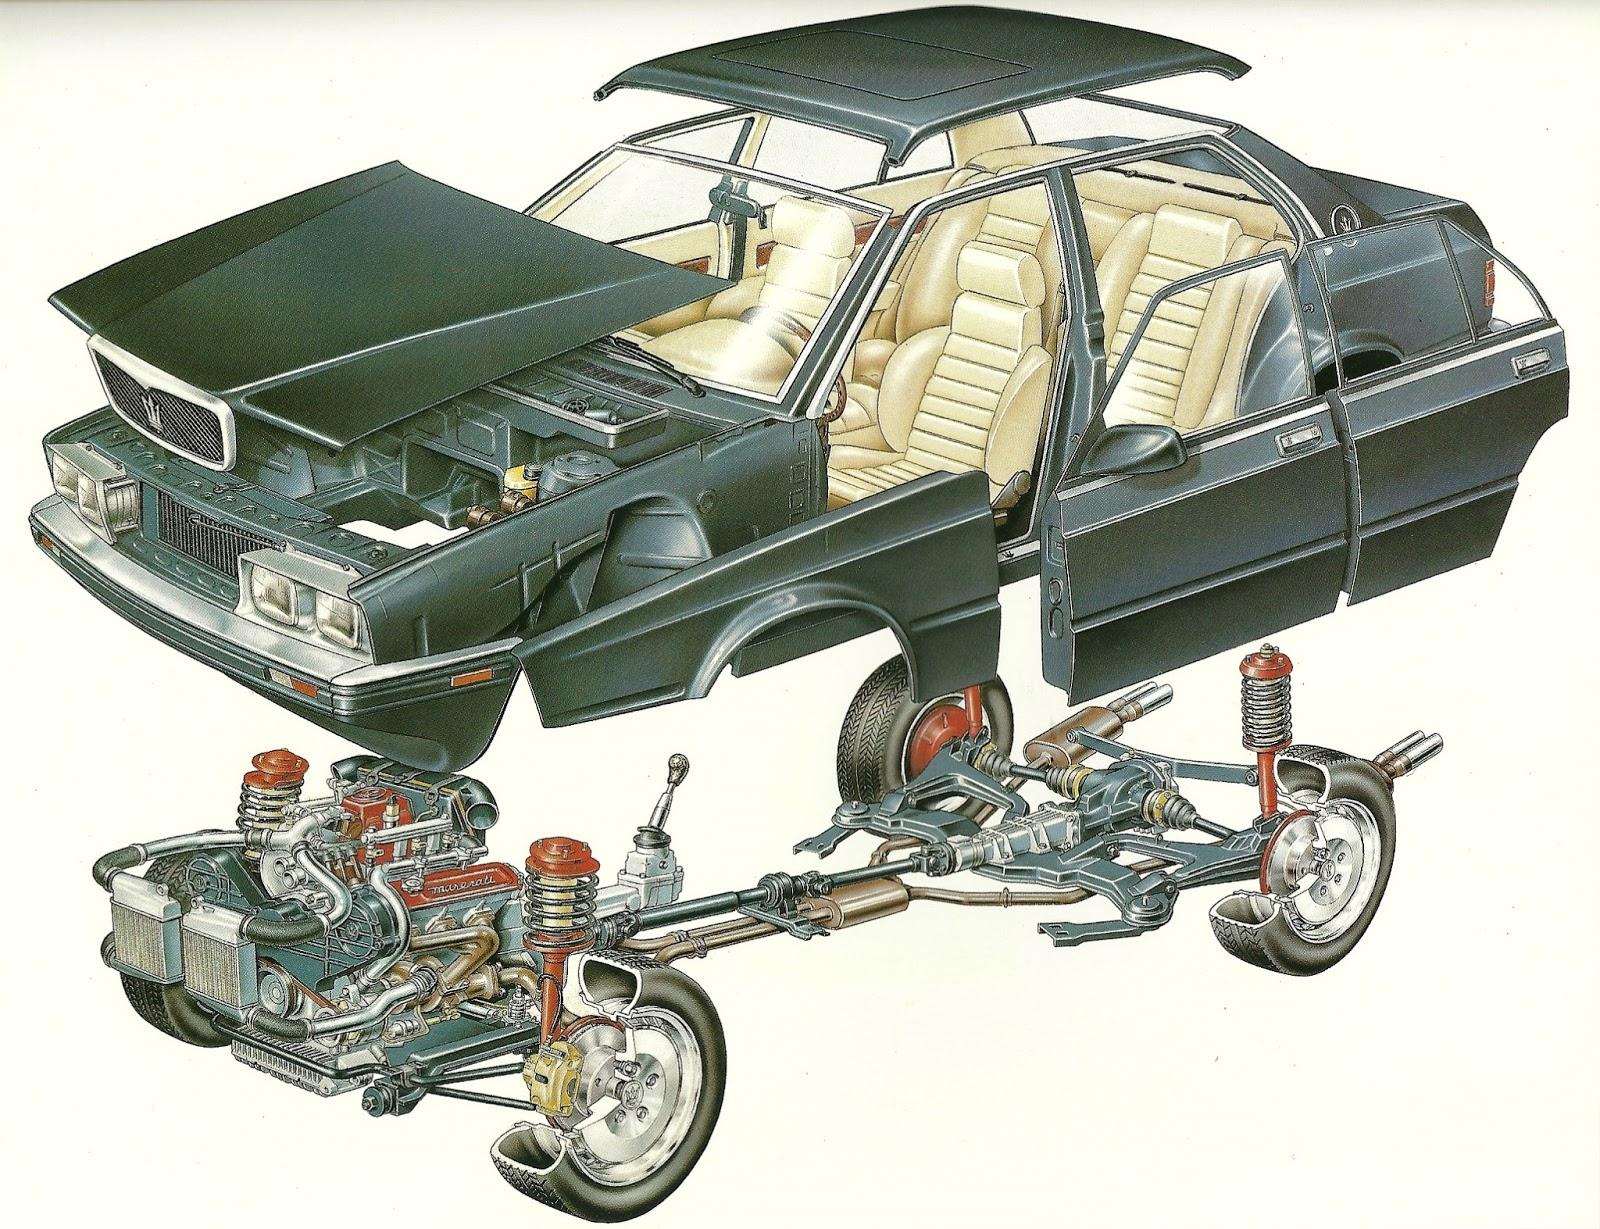 Maserati Biturbo cutaway